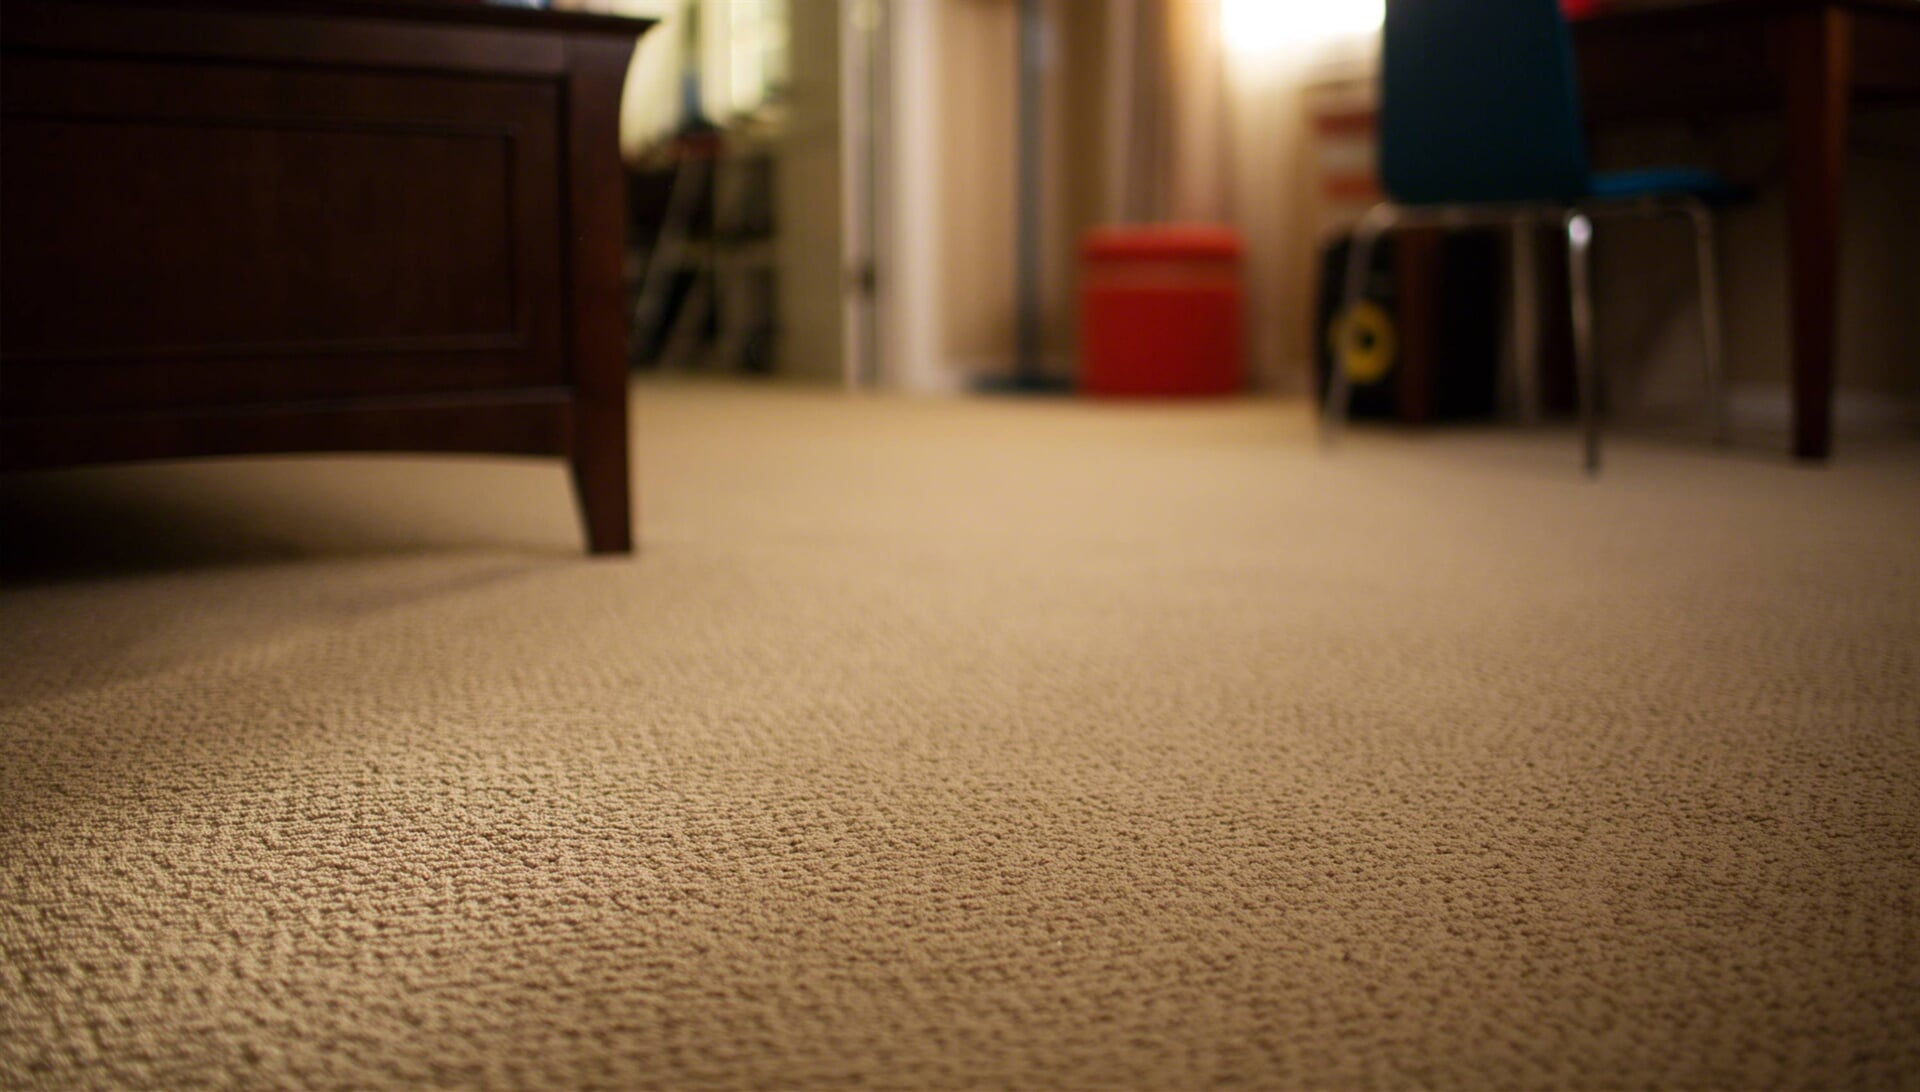 Carpet from Carpet King Interiors in Fallon, NV